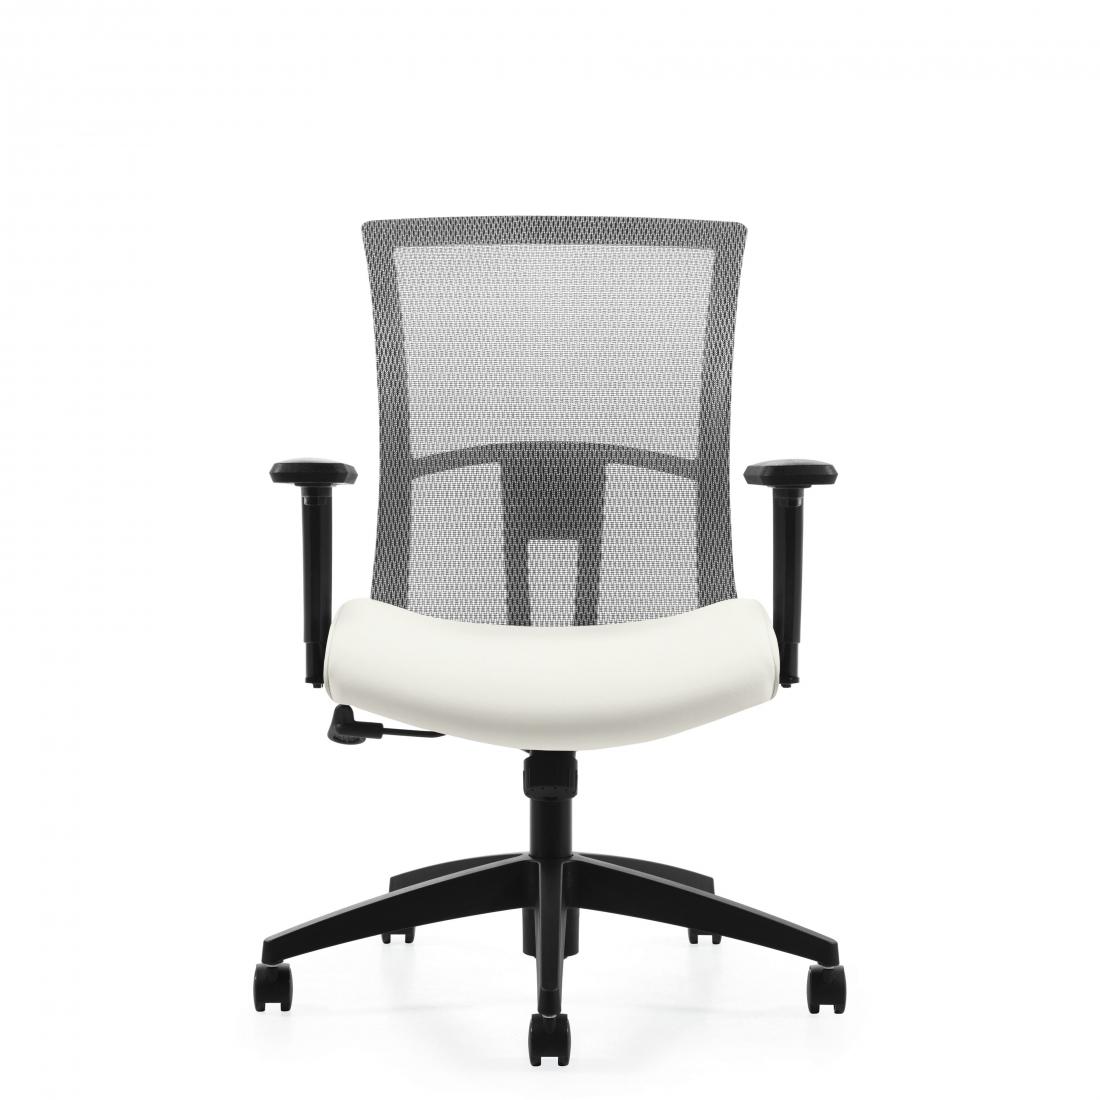 Vion Mid-Back Tilter Chair  sc 1 st  Office Furniture NOW! & Office Furniture NOW! Seating Products | Vion Mid-Back Tilter Chair